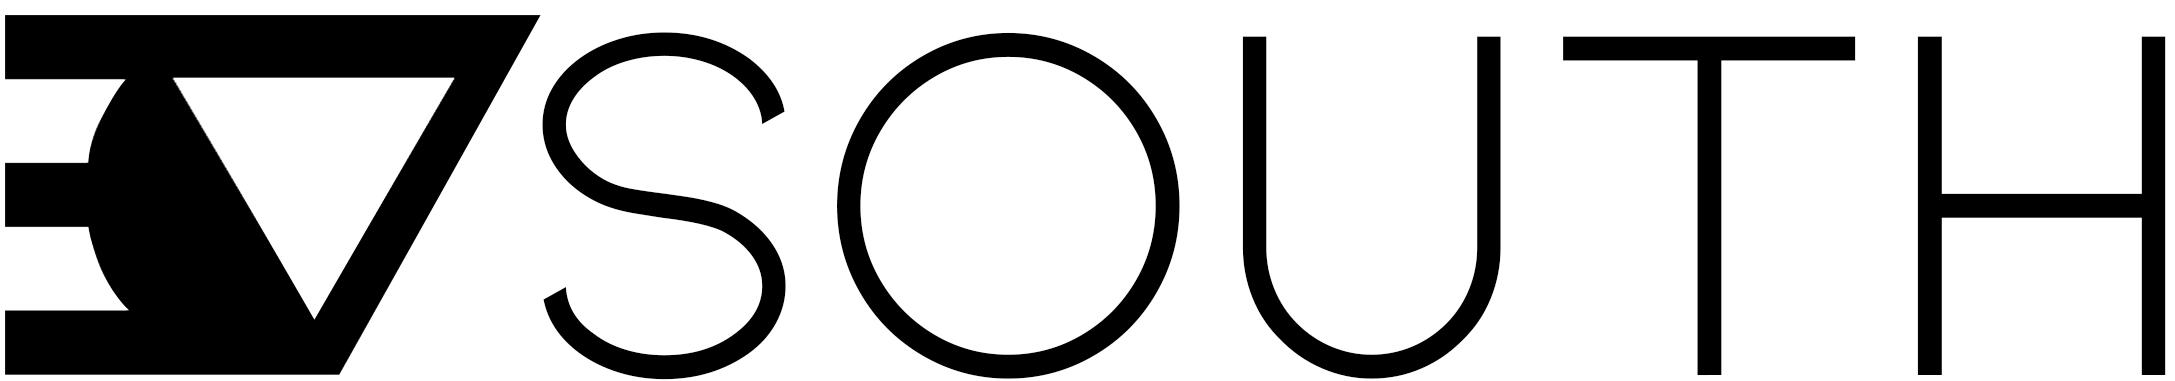 30 South logo